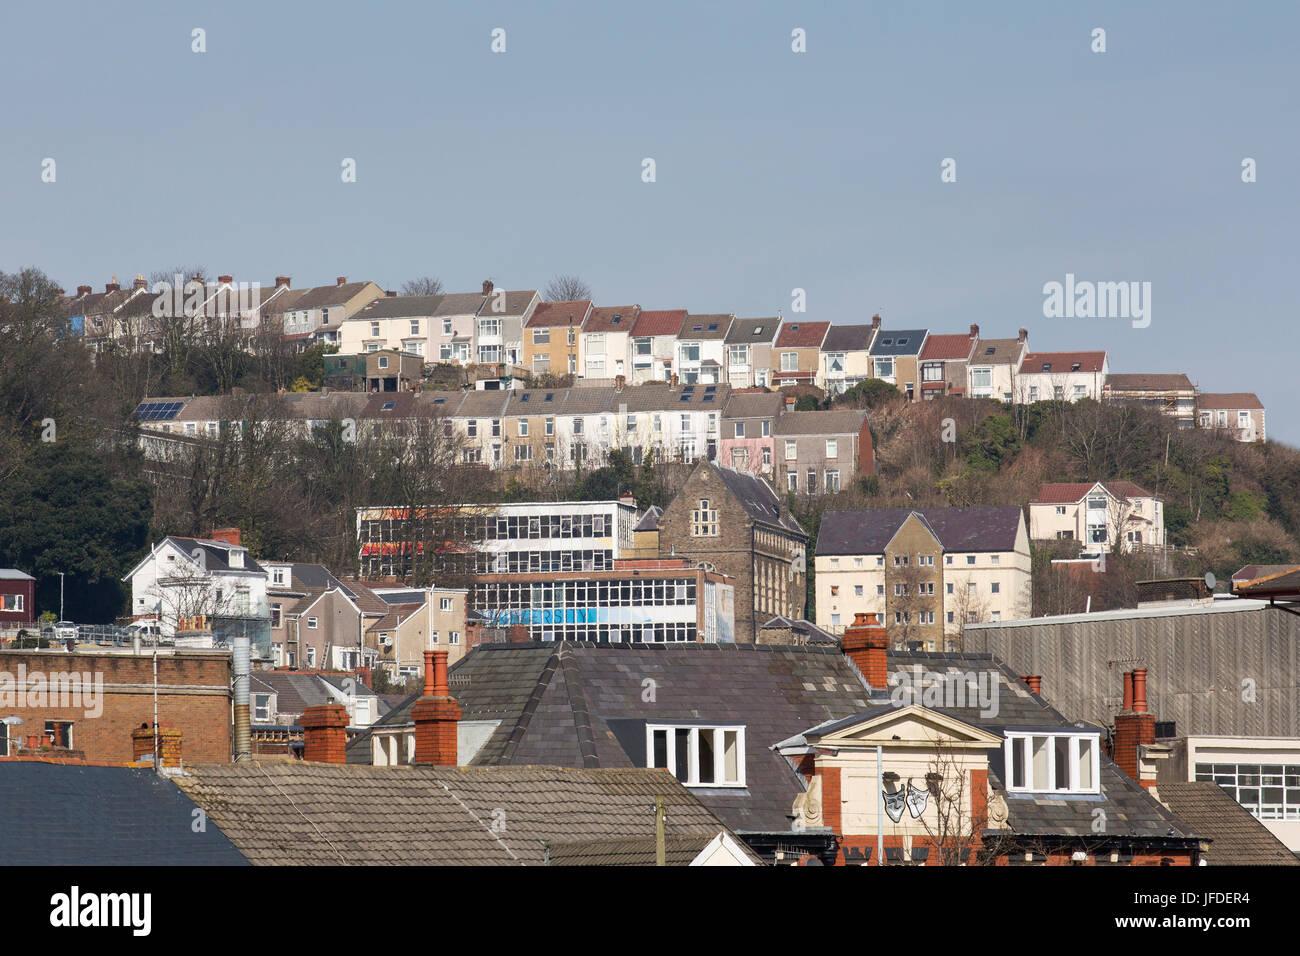 Houses in City Suburb Stock Photo